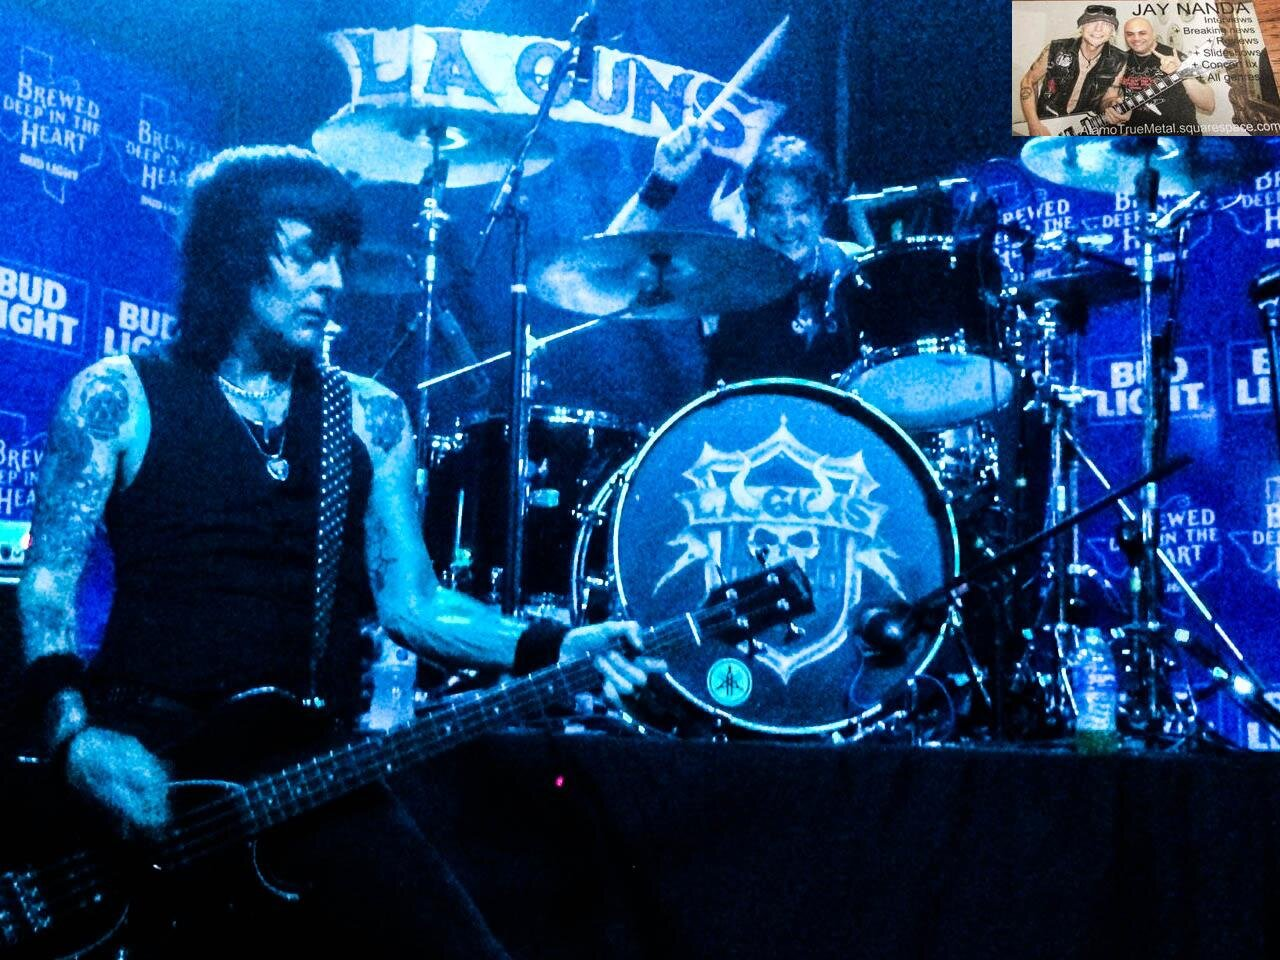 L.A. Guns bassist Johnny Martin and drummer Scot Coogan rock out on a classic tune Saturday night at Quatemain's Pub in Live Oak.